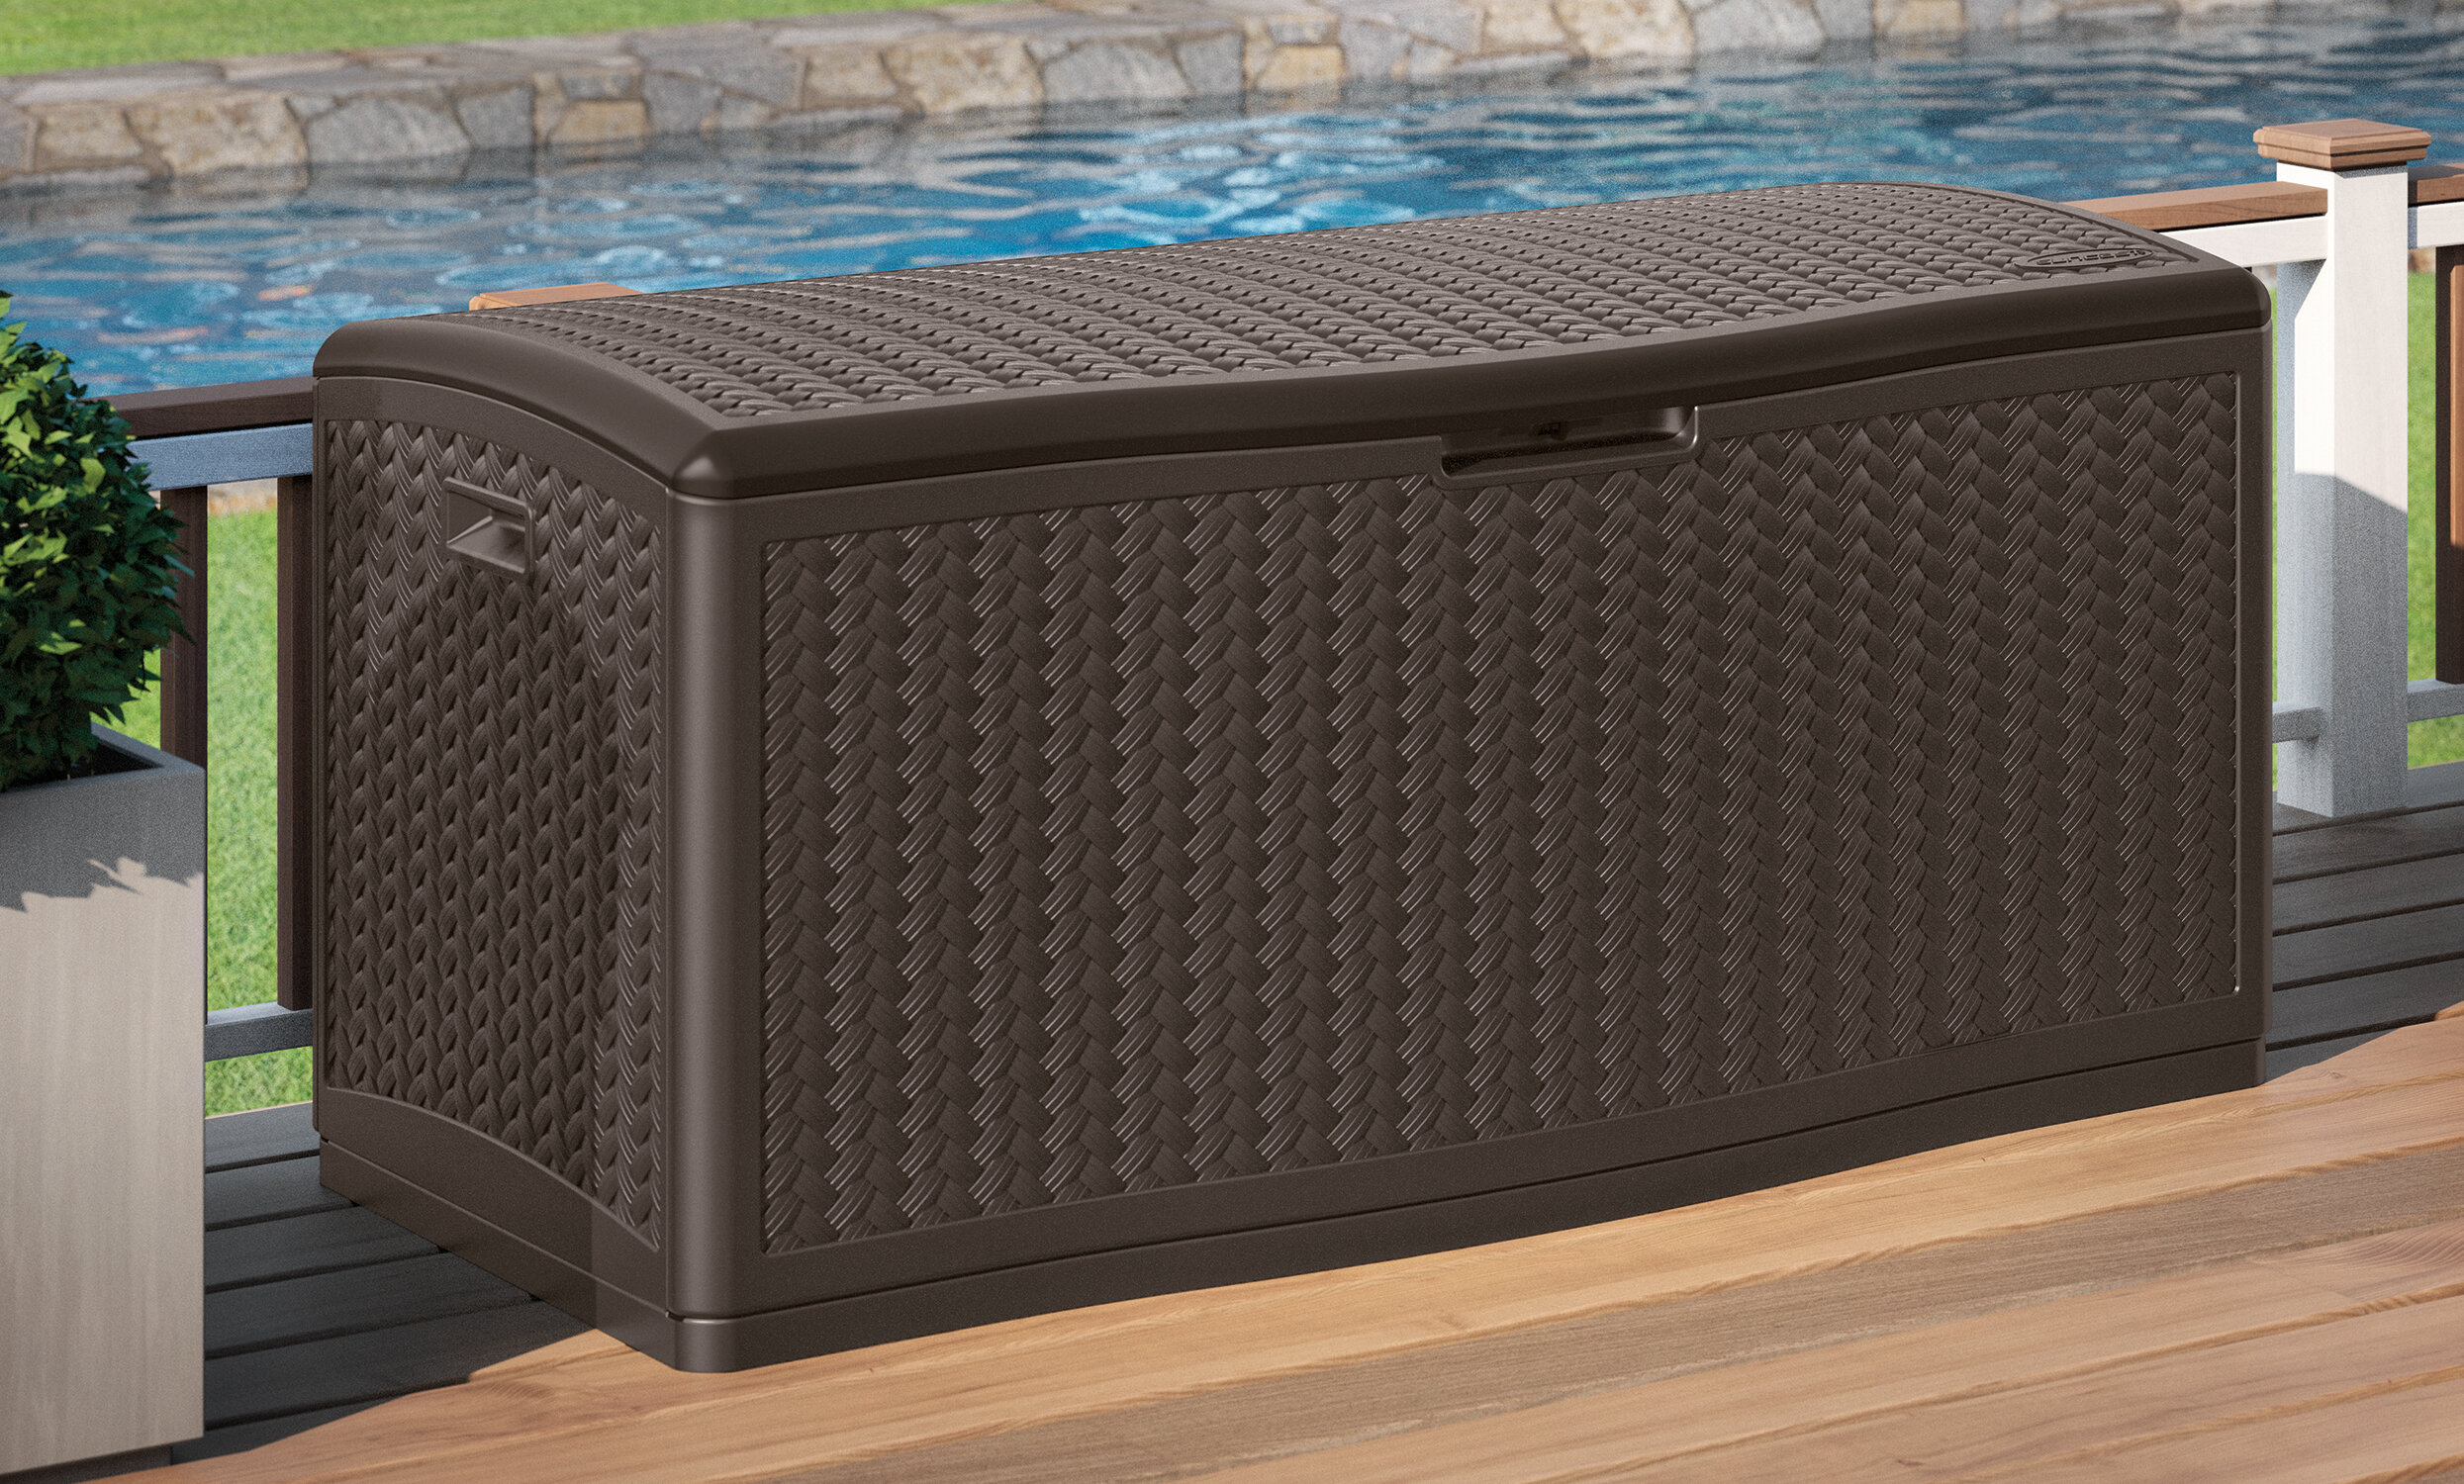 Suncast Blow Molded Herringbone 124 Gallon Resin Deck Box U0026 Reviews |  Wayfair